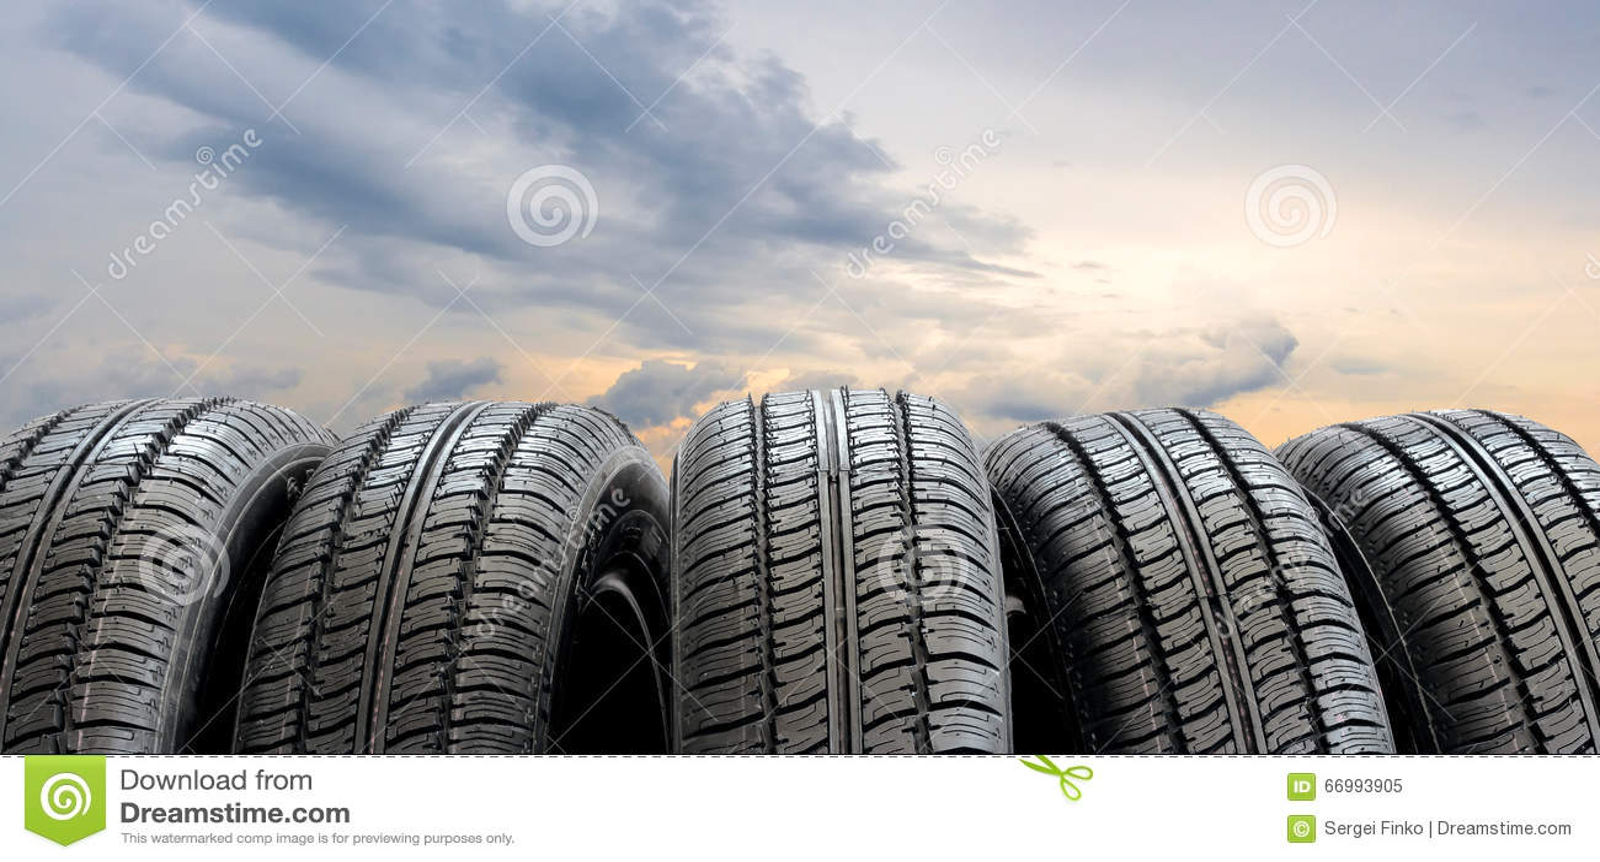 Conjunto de neumáticos